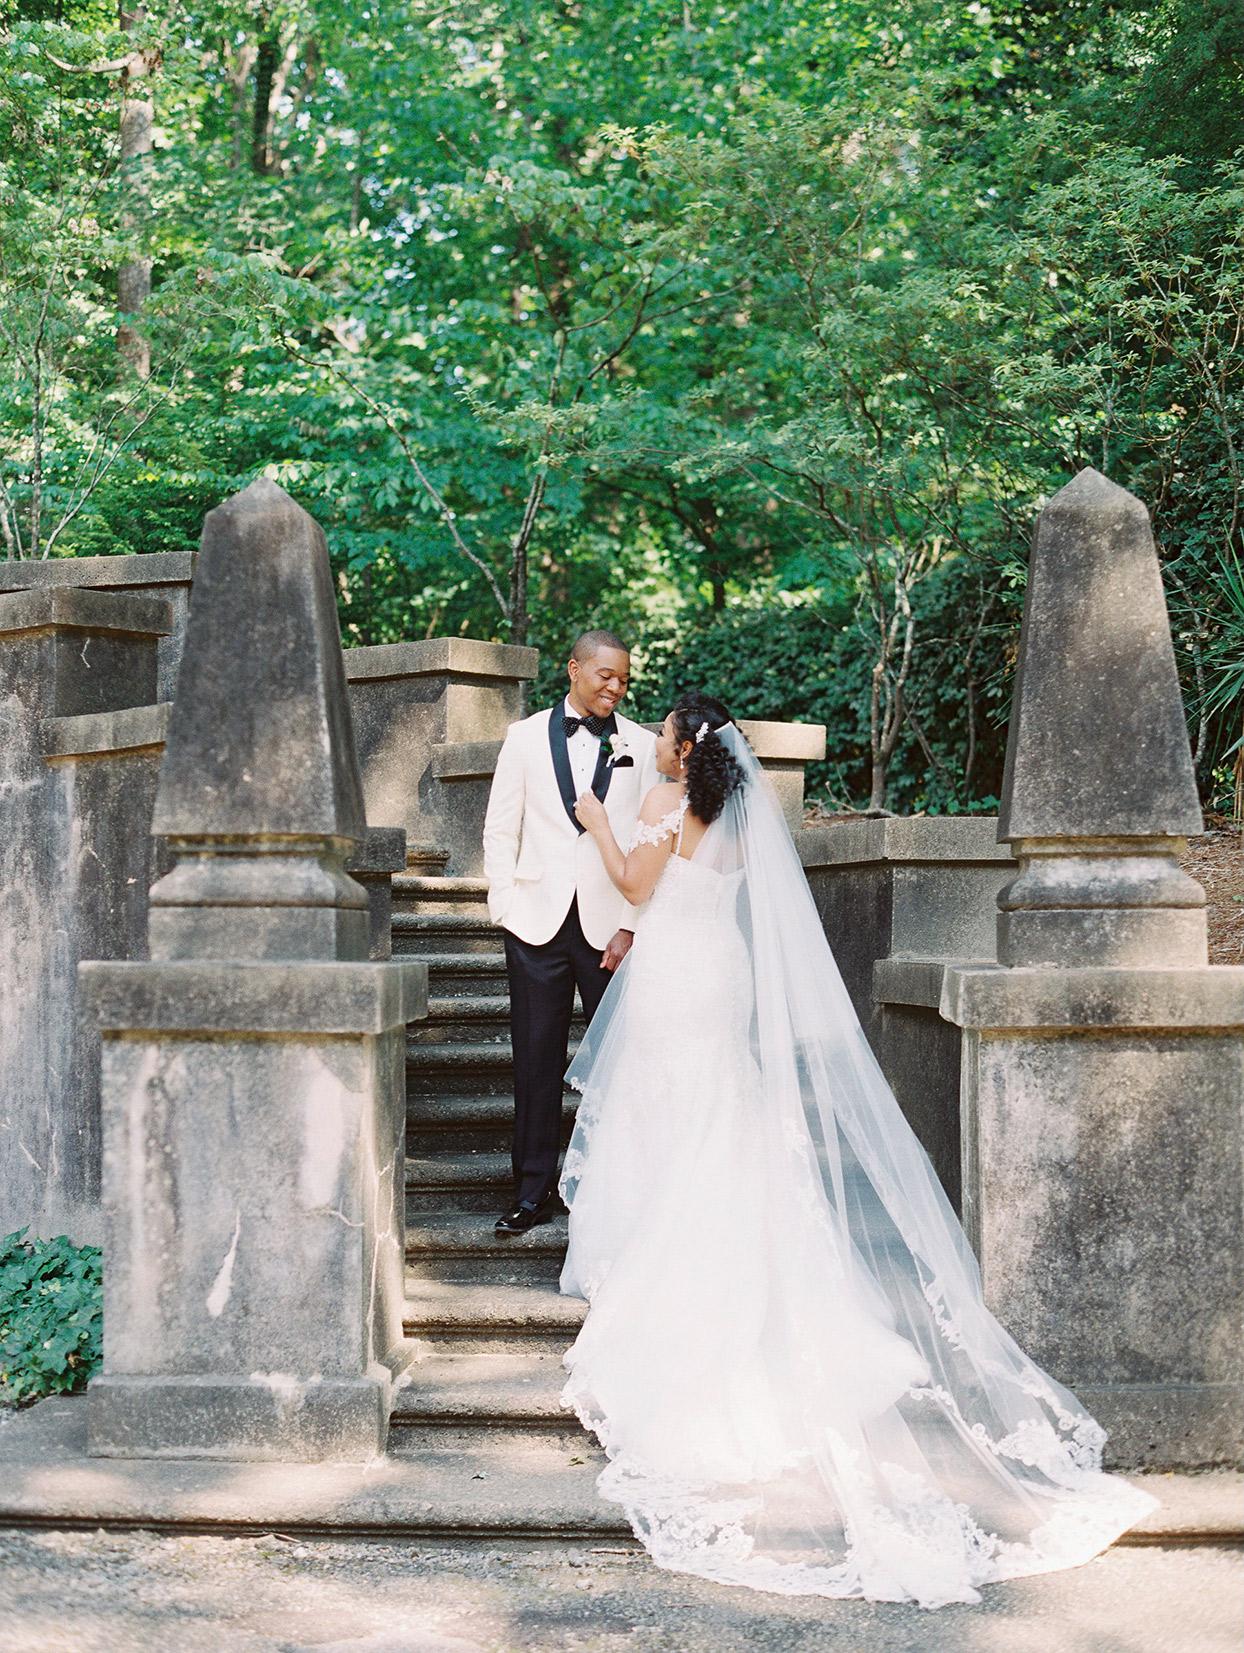 amelia justin wedding couple on stone steps